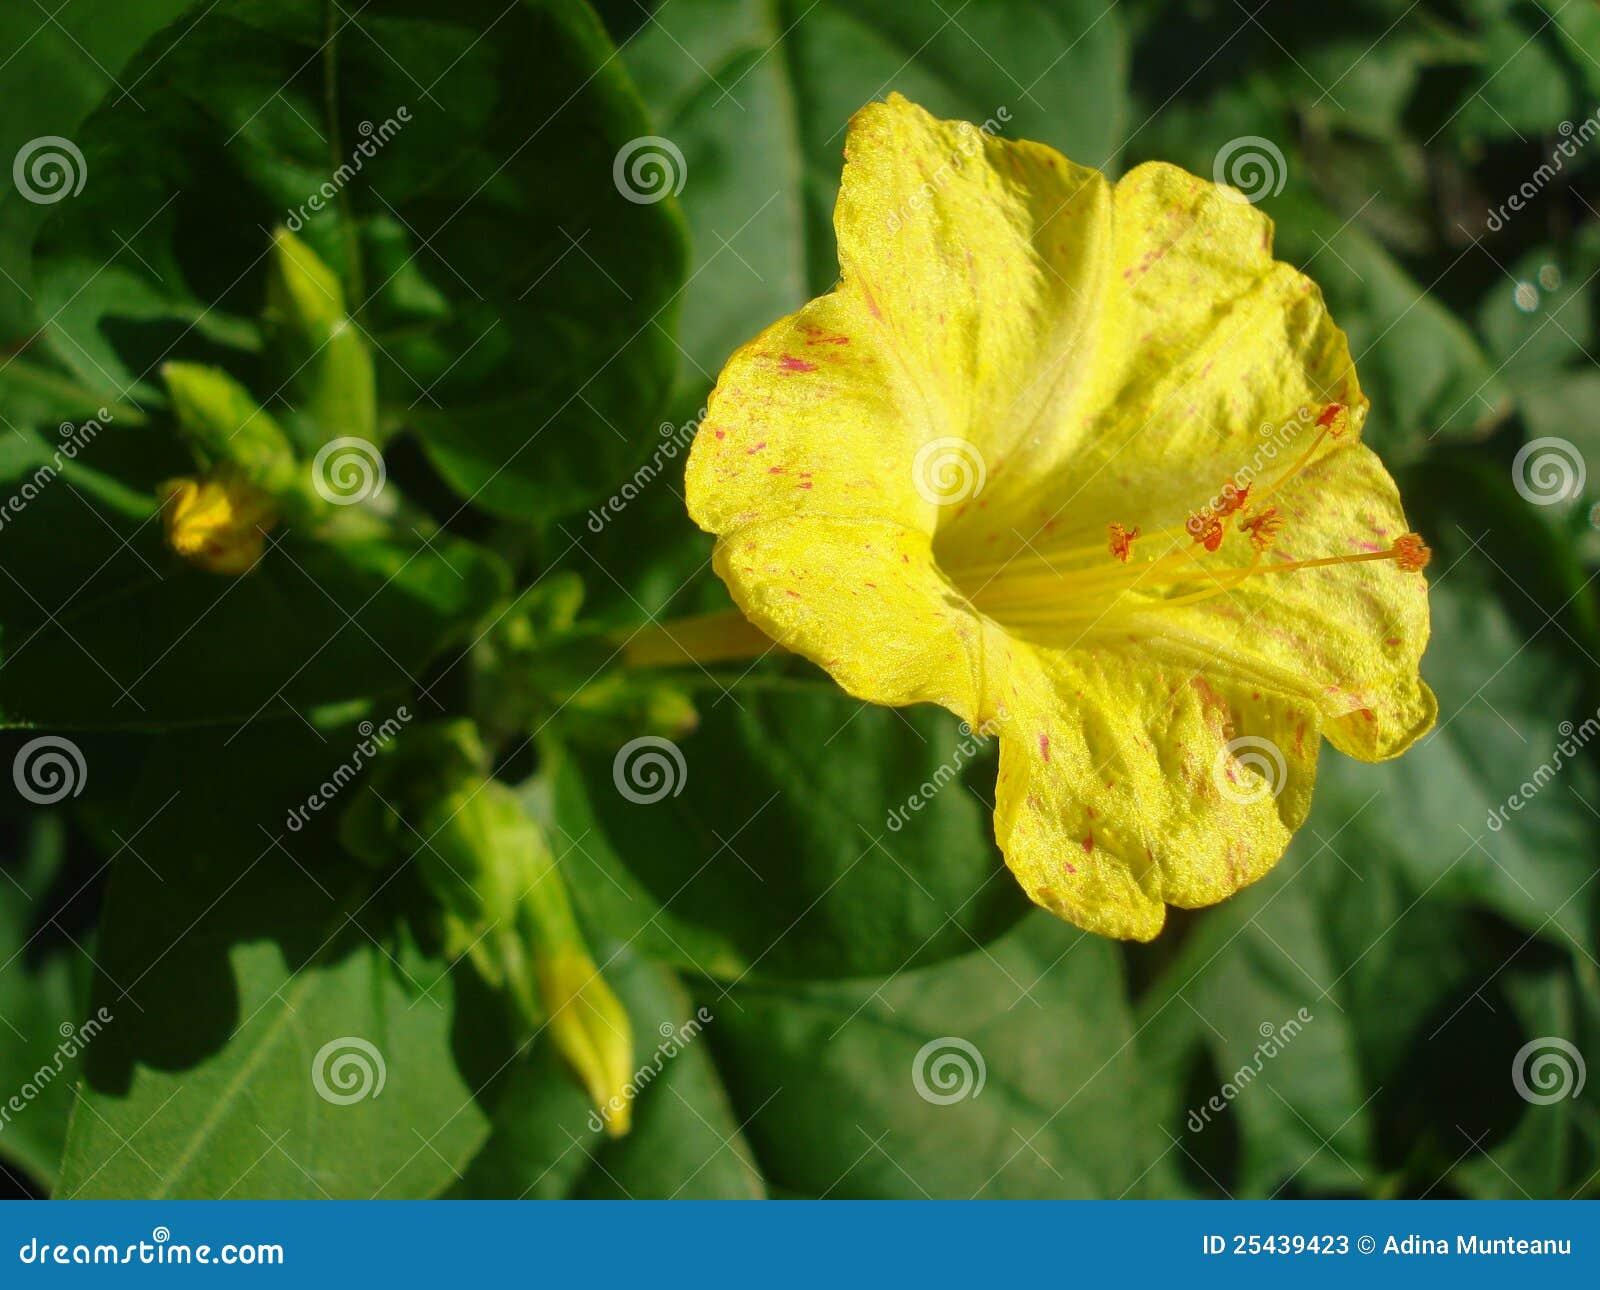 Yellow flower with orange stamens stock image image of blossom yellow flower with orange stamens mightylinksfo